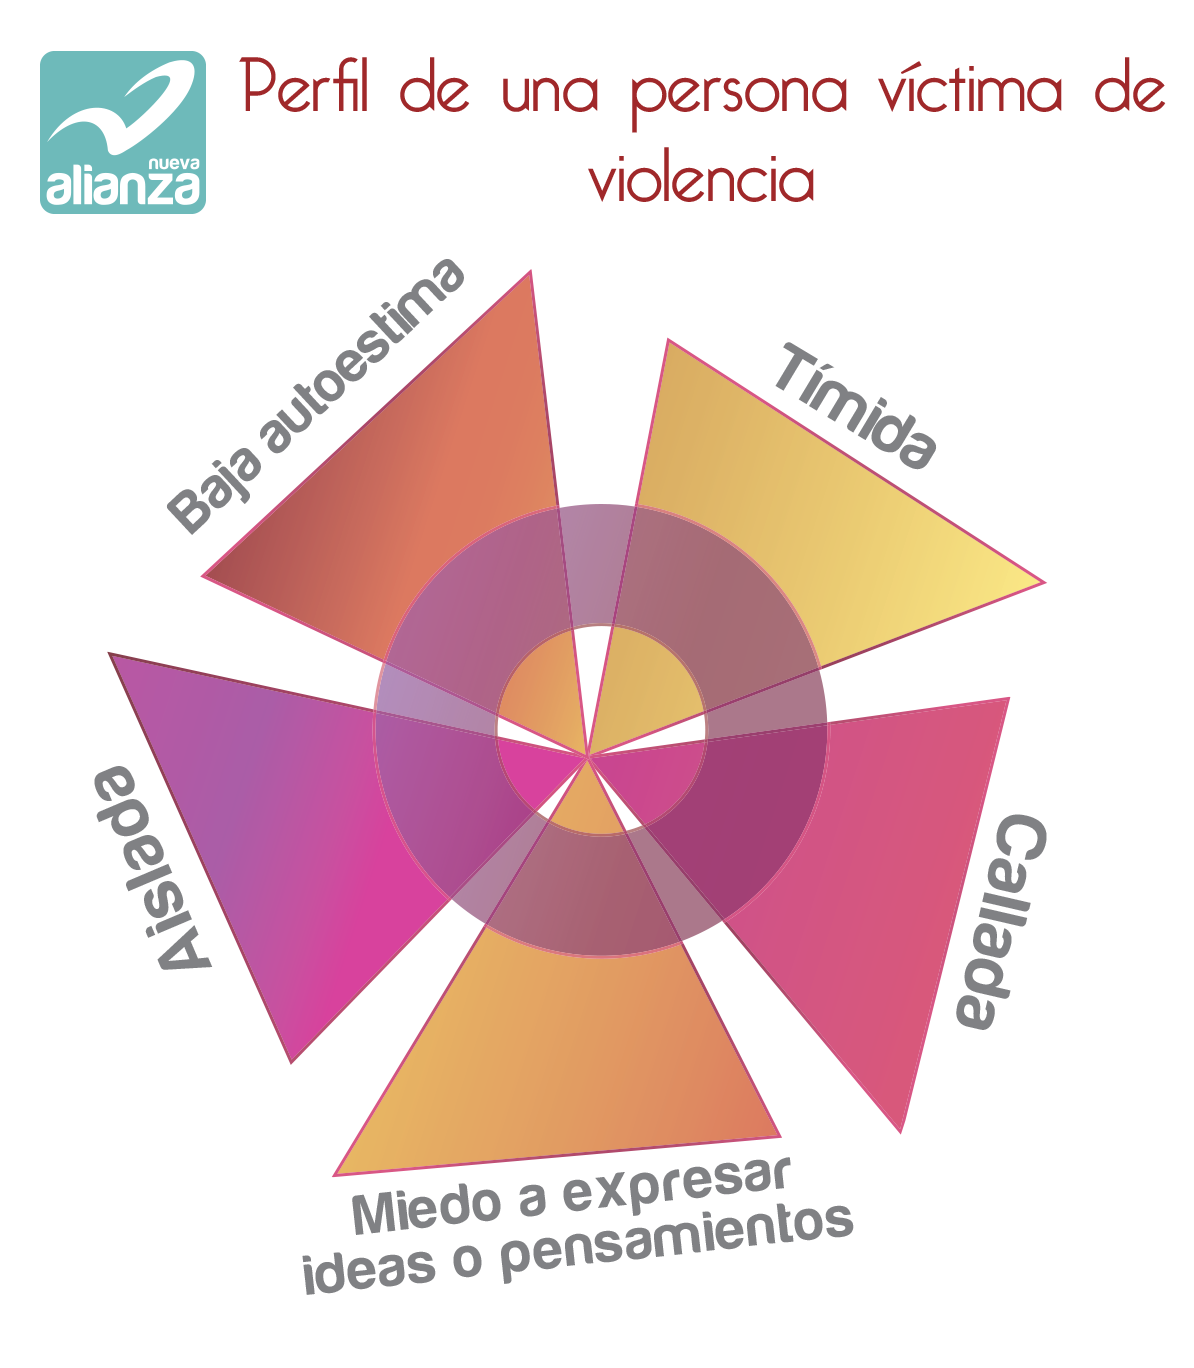 Perfil de una persona víctima de la violencia